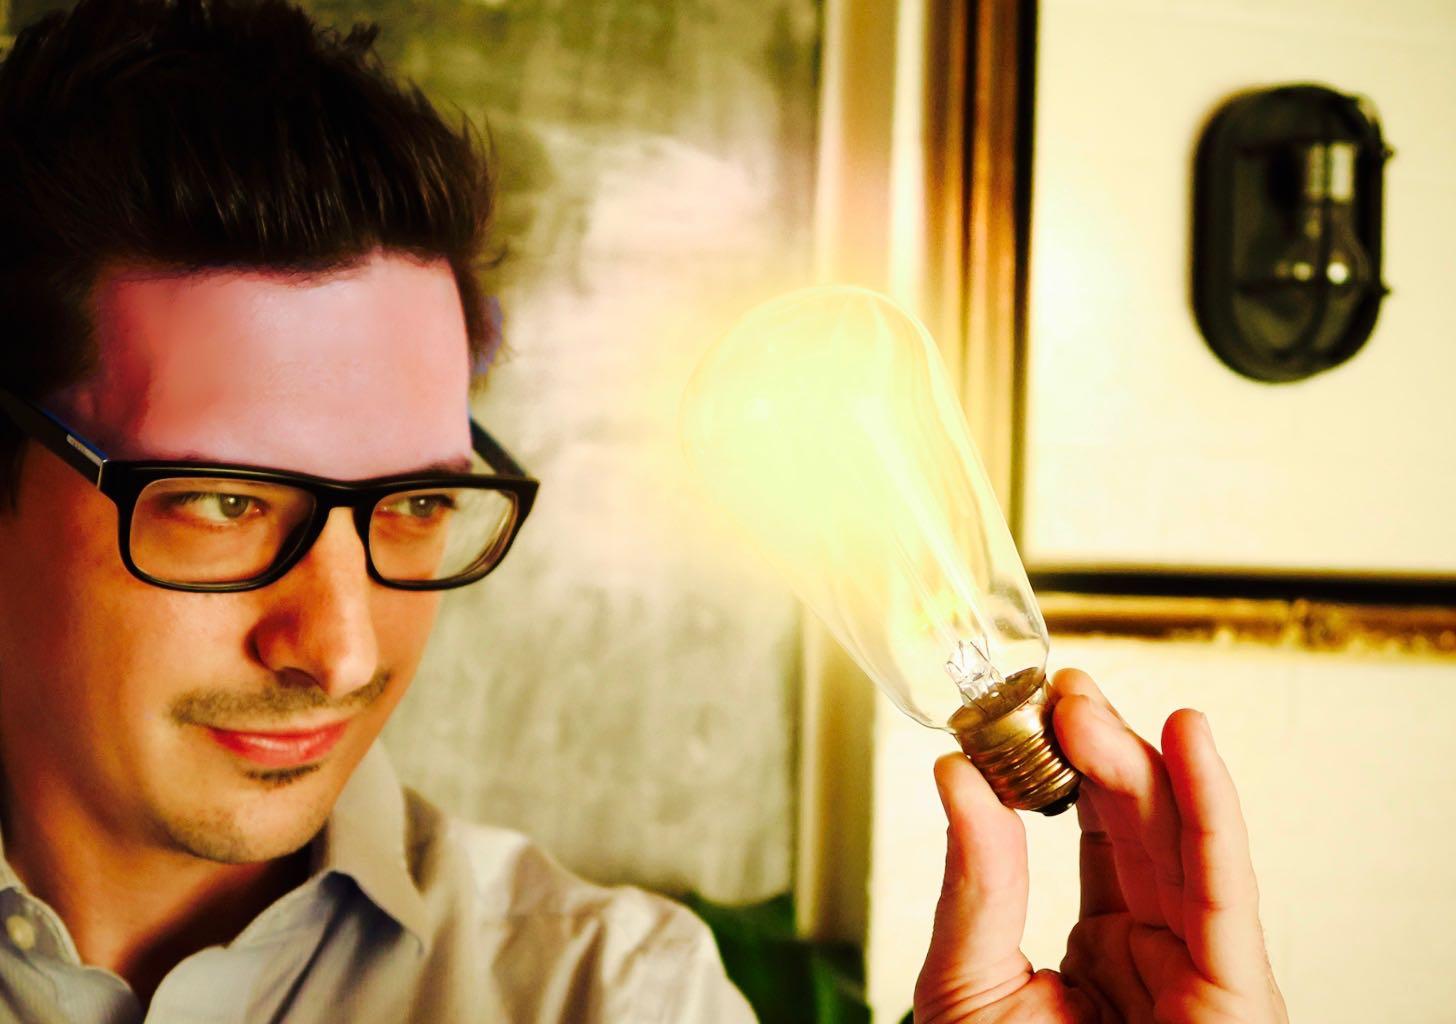 glow-bulb-promo-copy-2